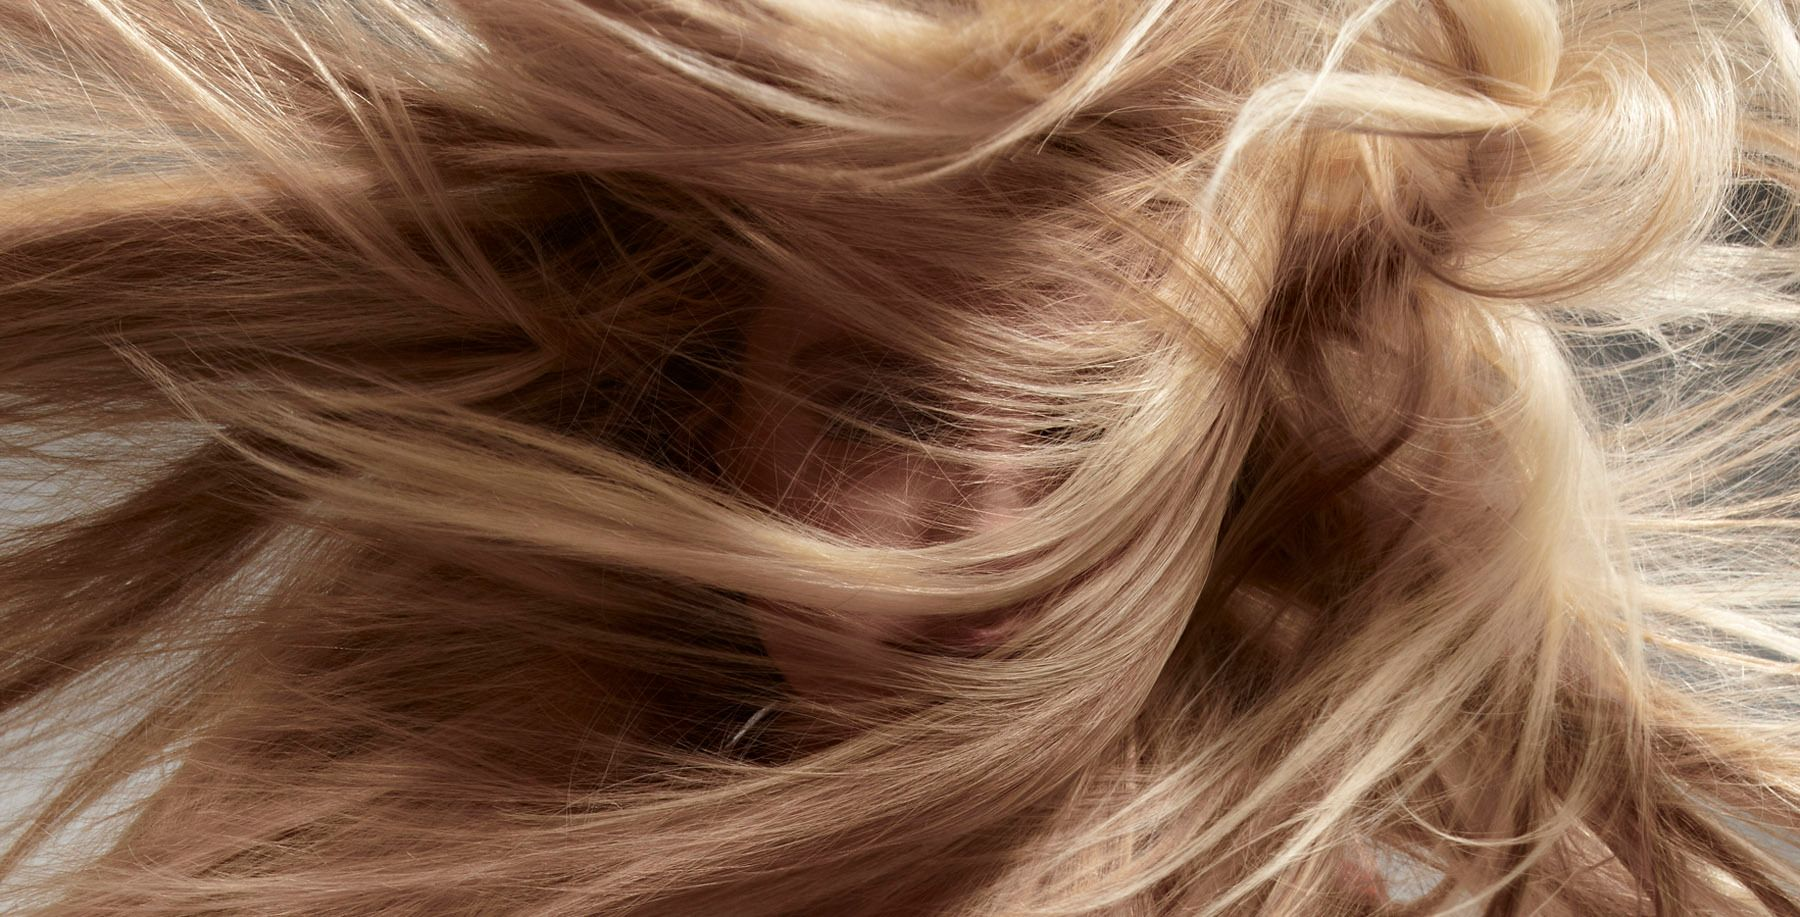 1Beauty_20111005_HairMakeUp_010r.jpg